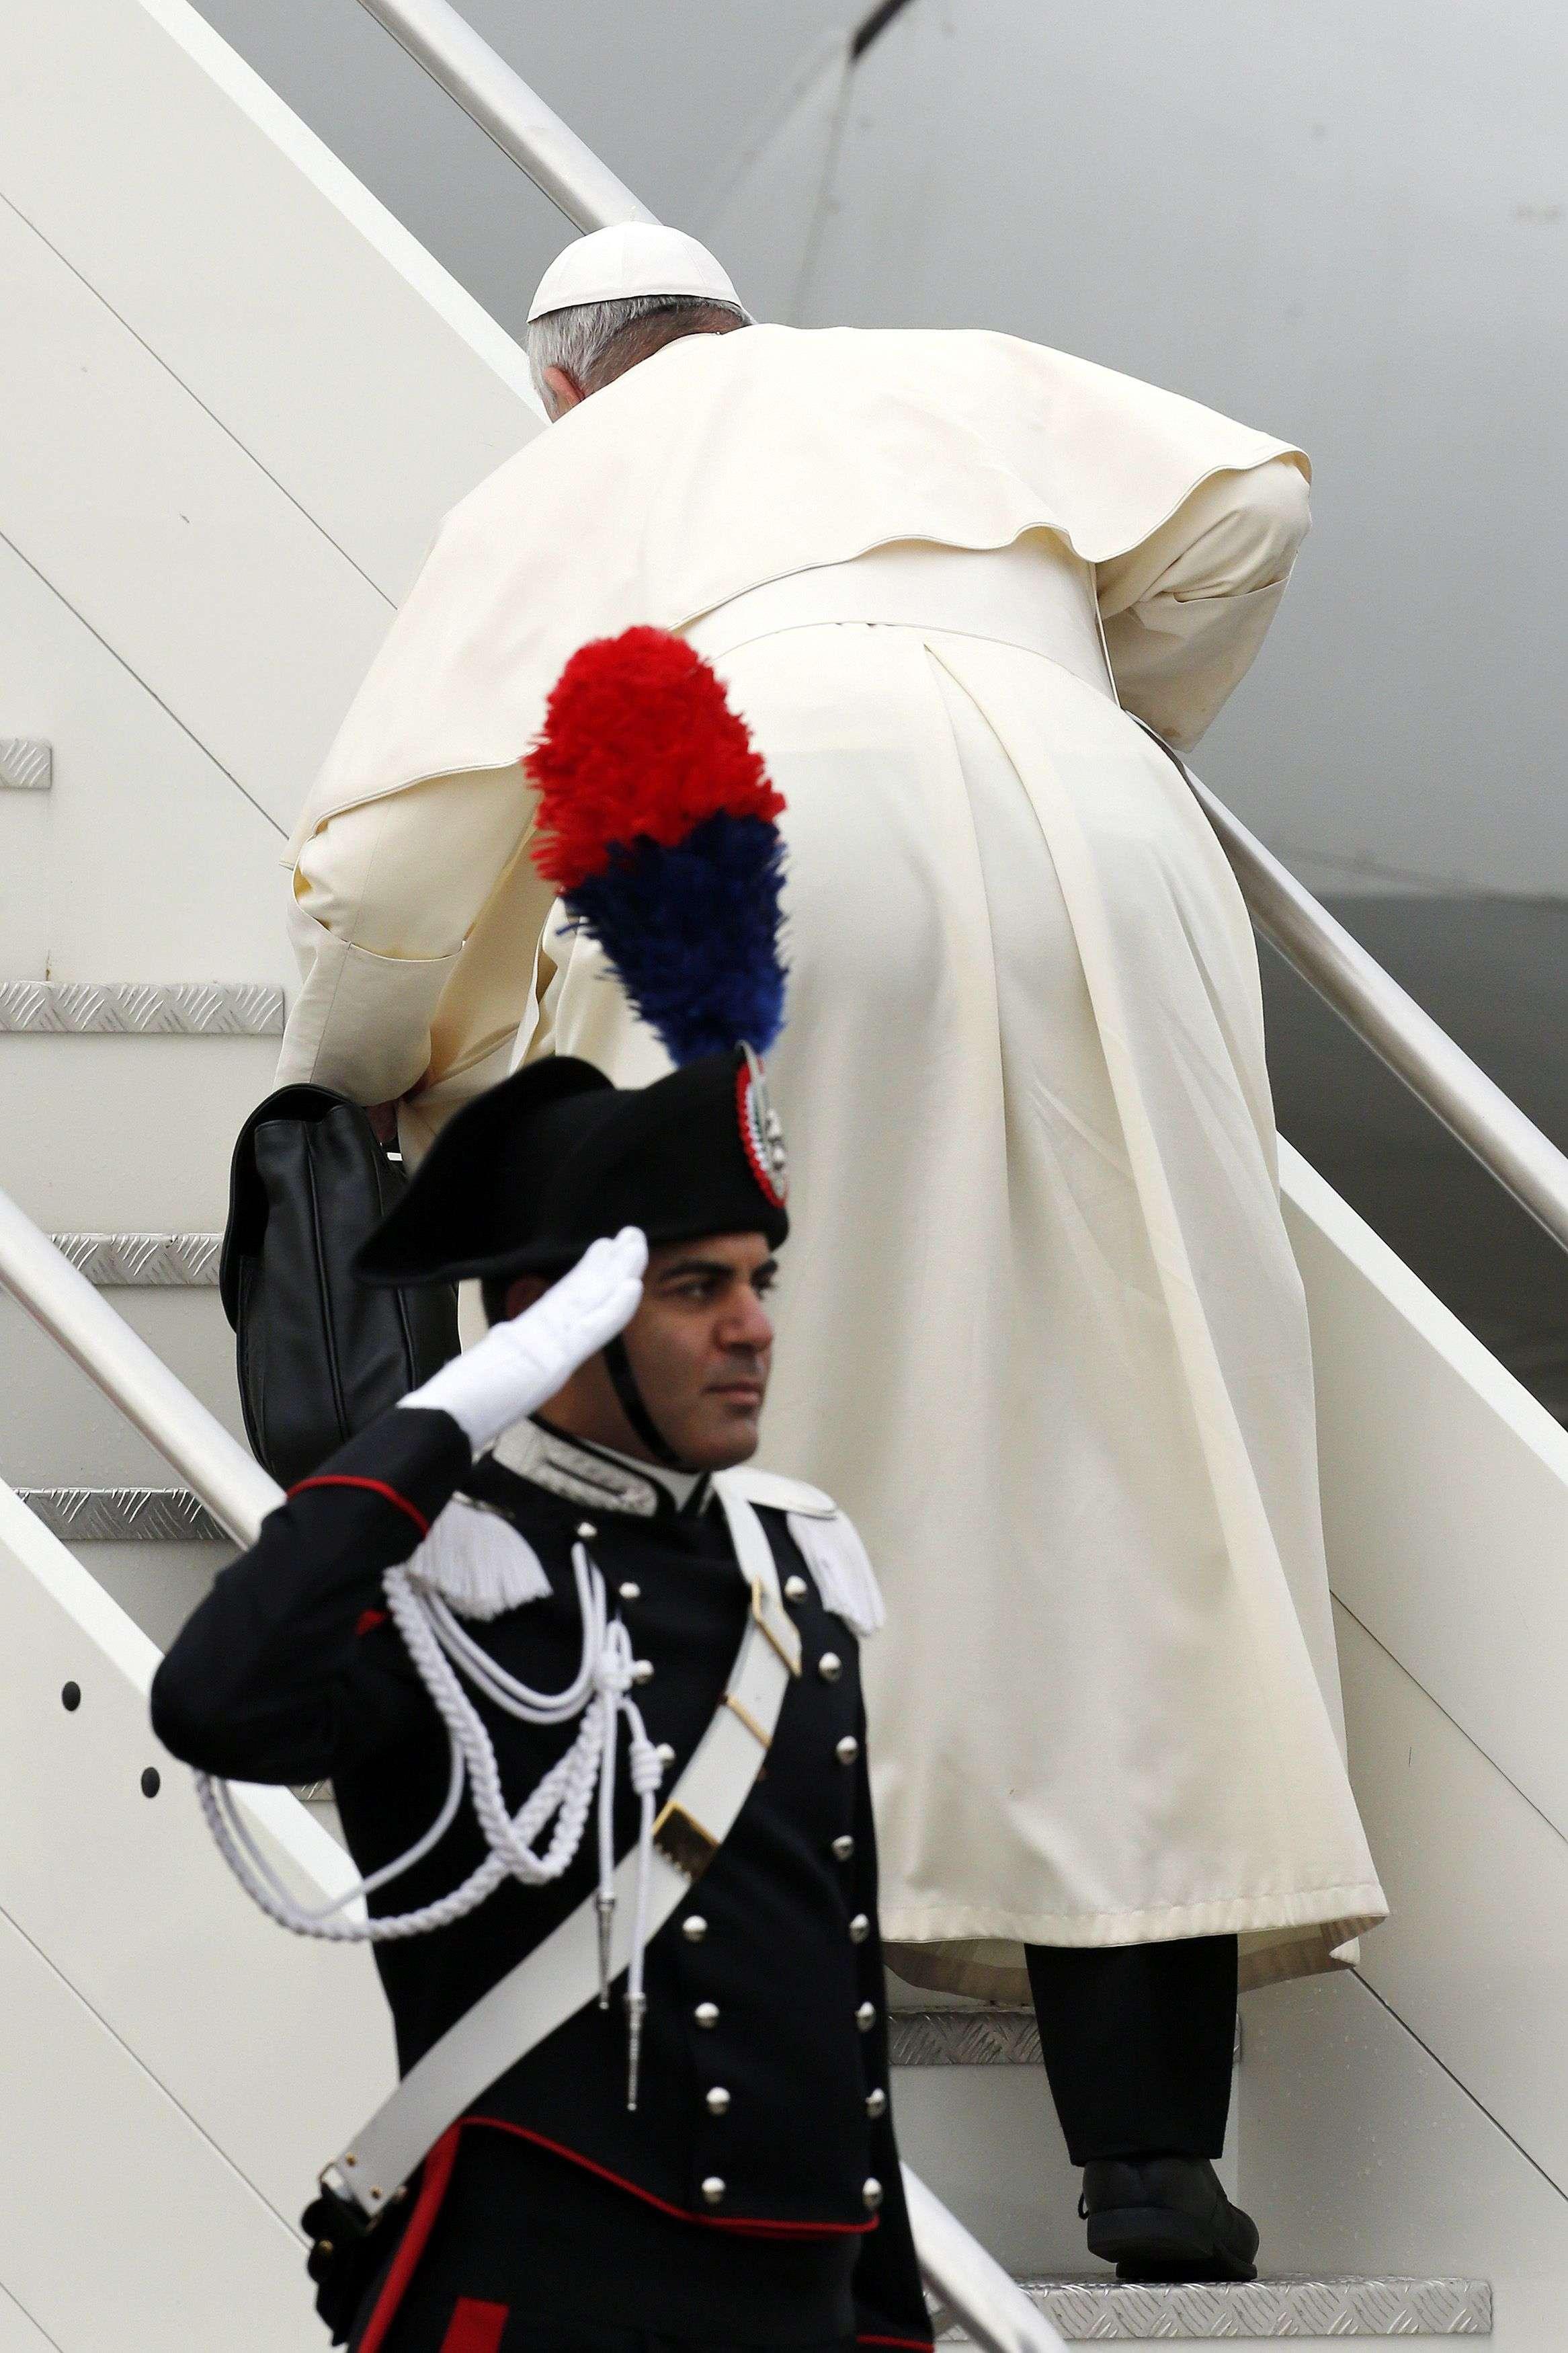 Foto: Giampiero Sposito/Reuters